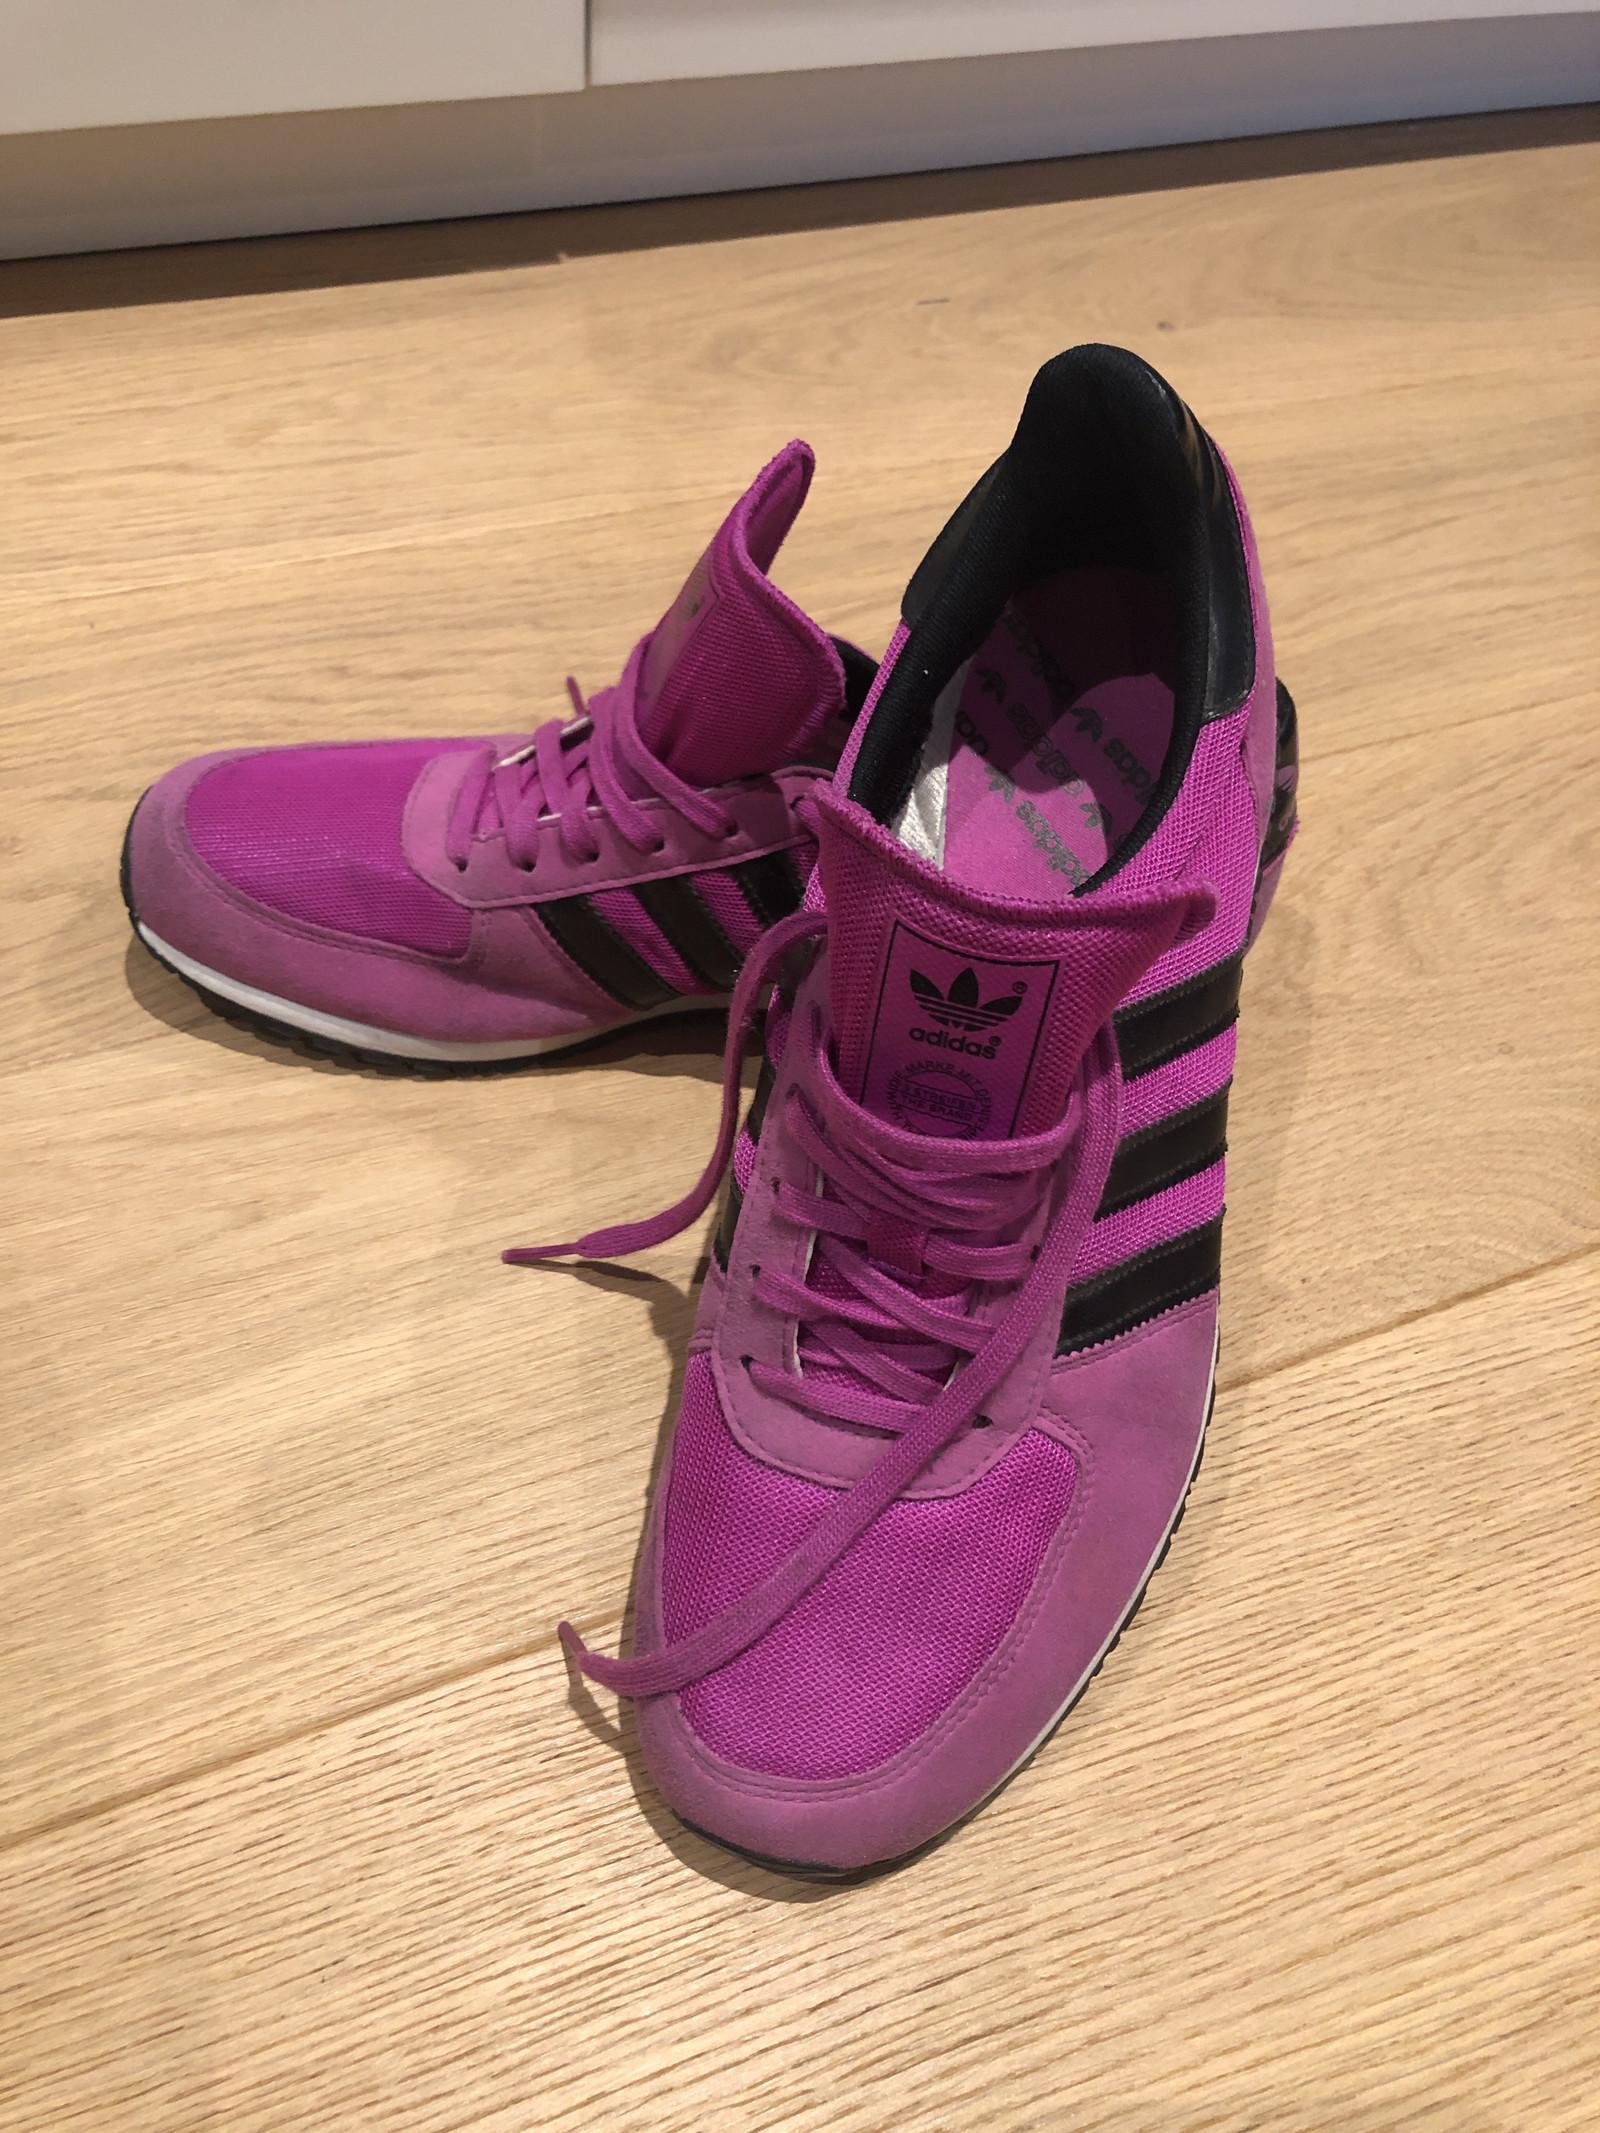 Adidas sko str. 4142 | FINN.no